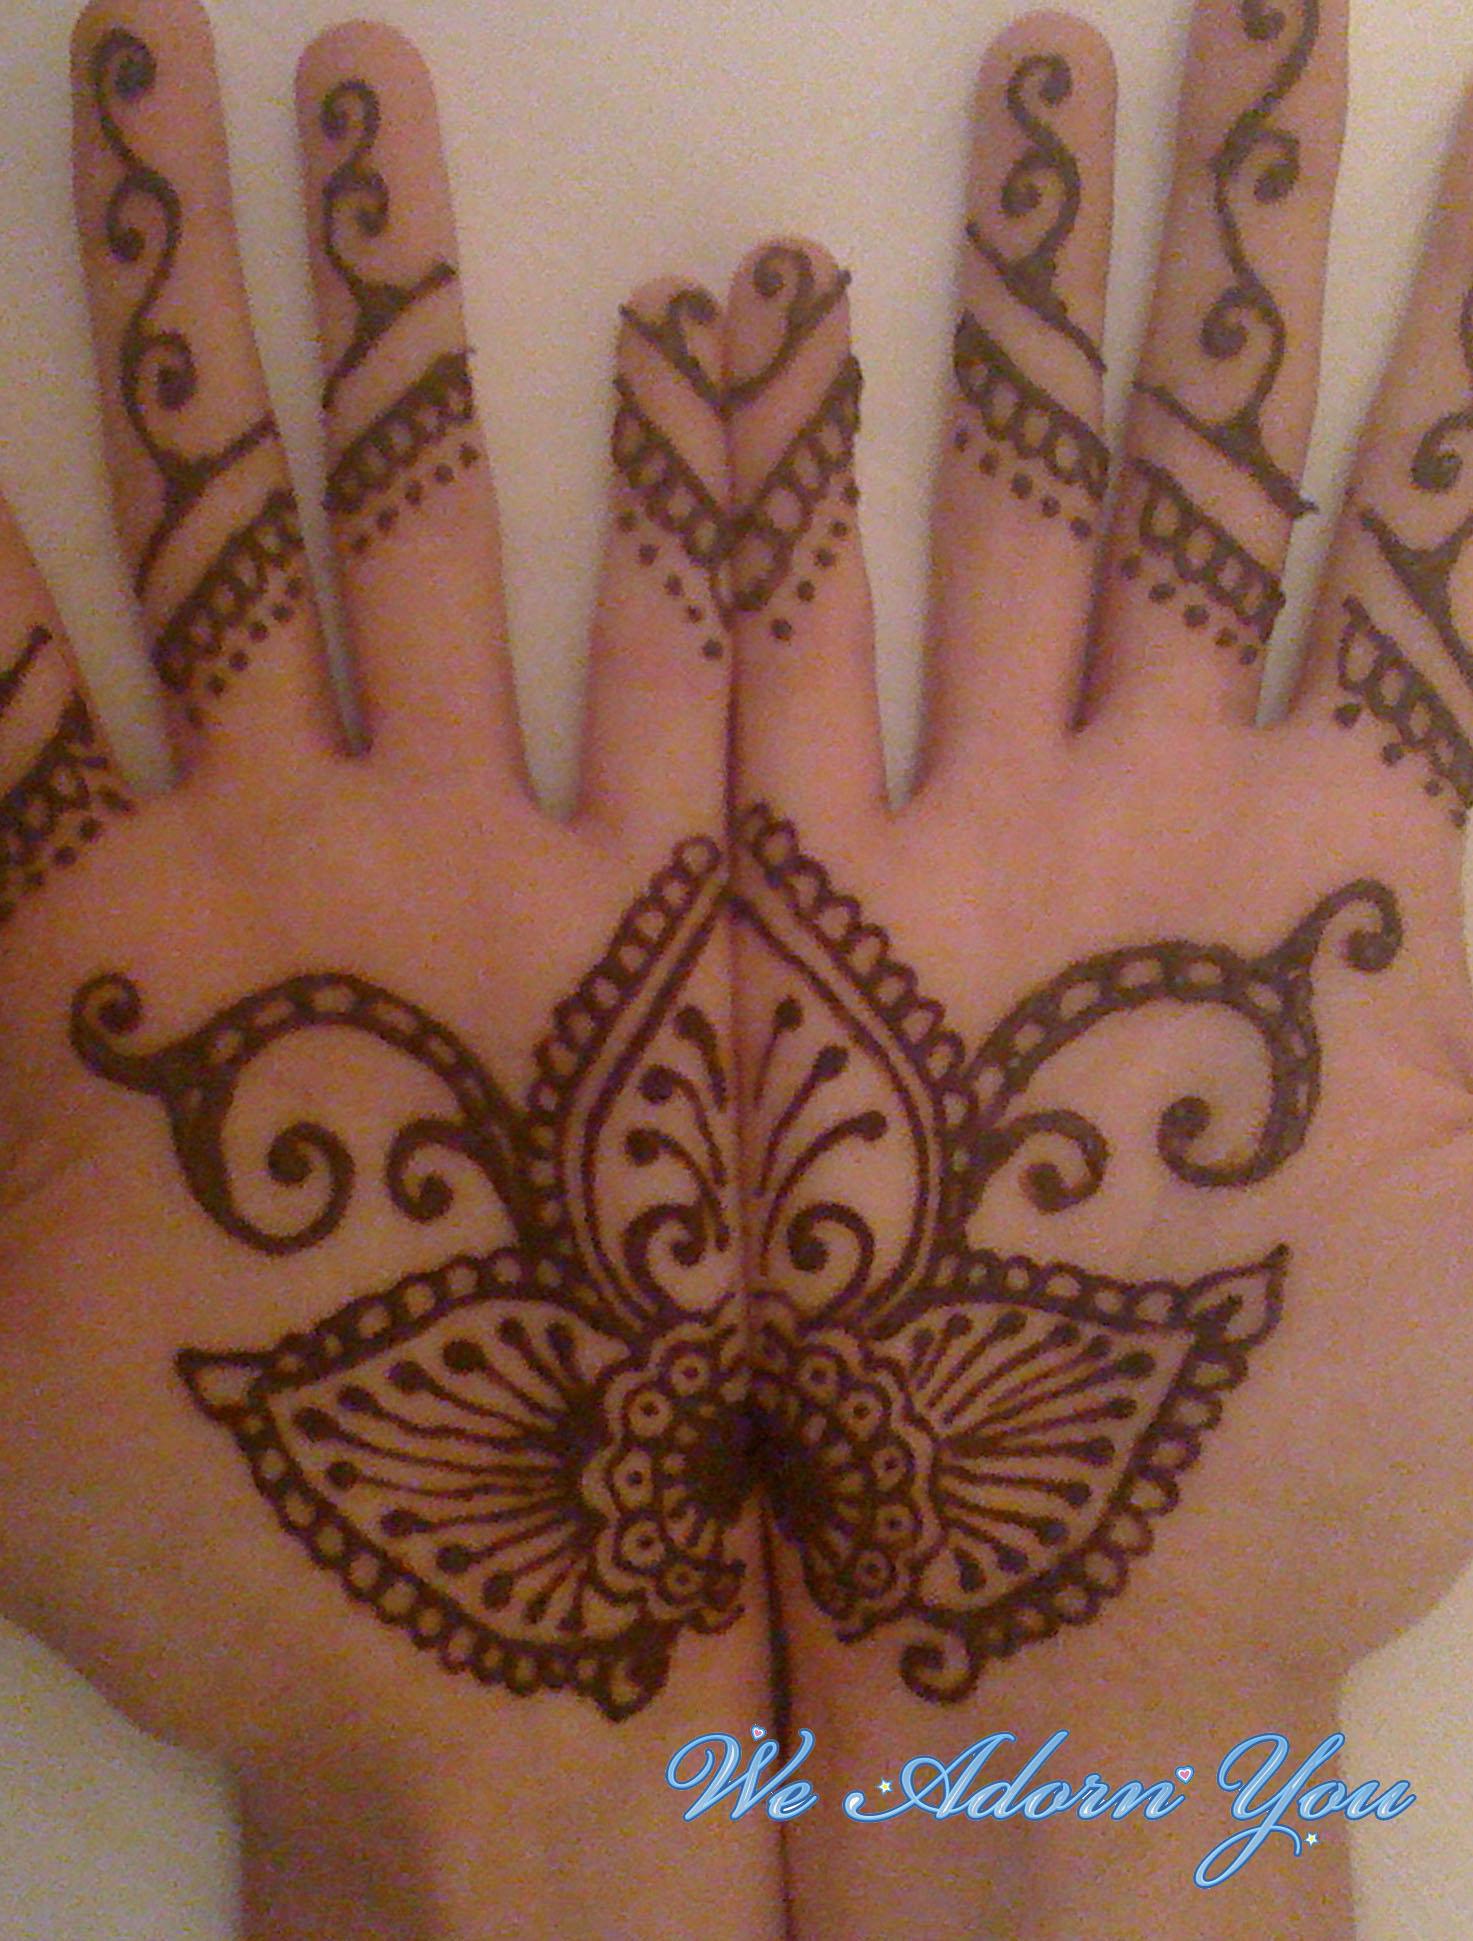 Henna Hand NYC - We Adorn You.jpg